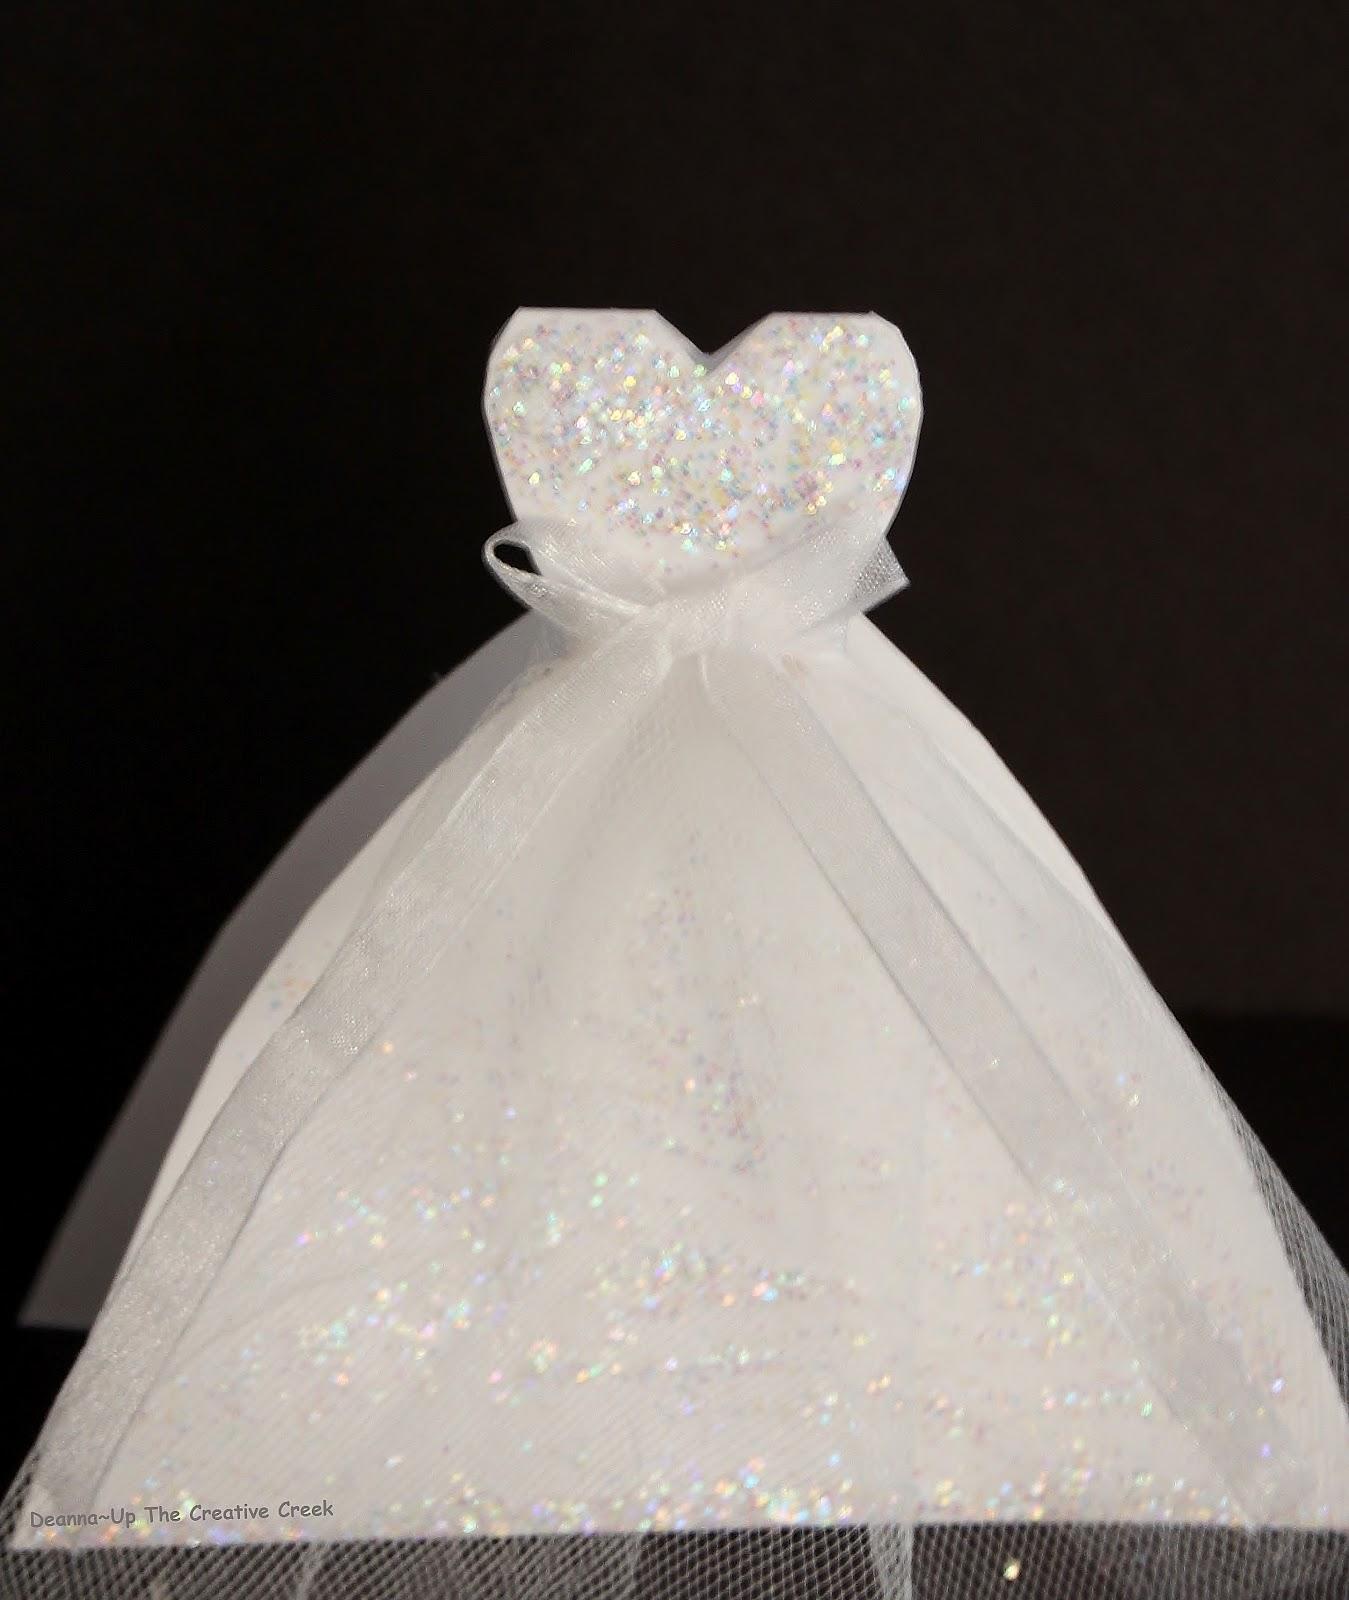 Up the Creative Creek: Wedding Dress